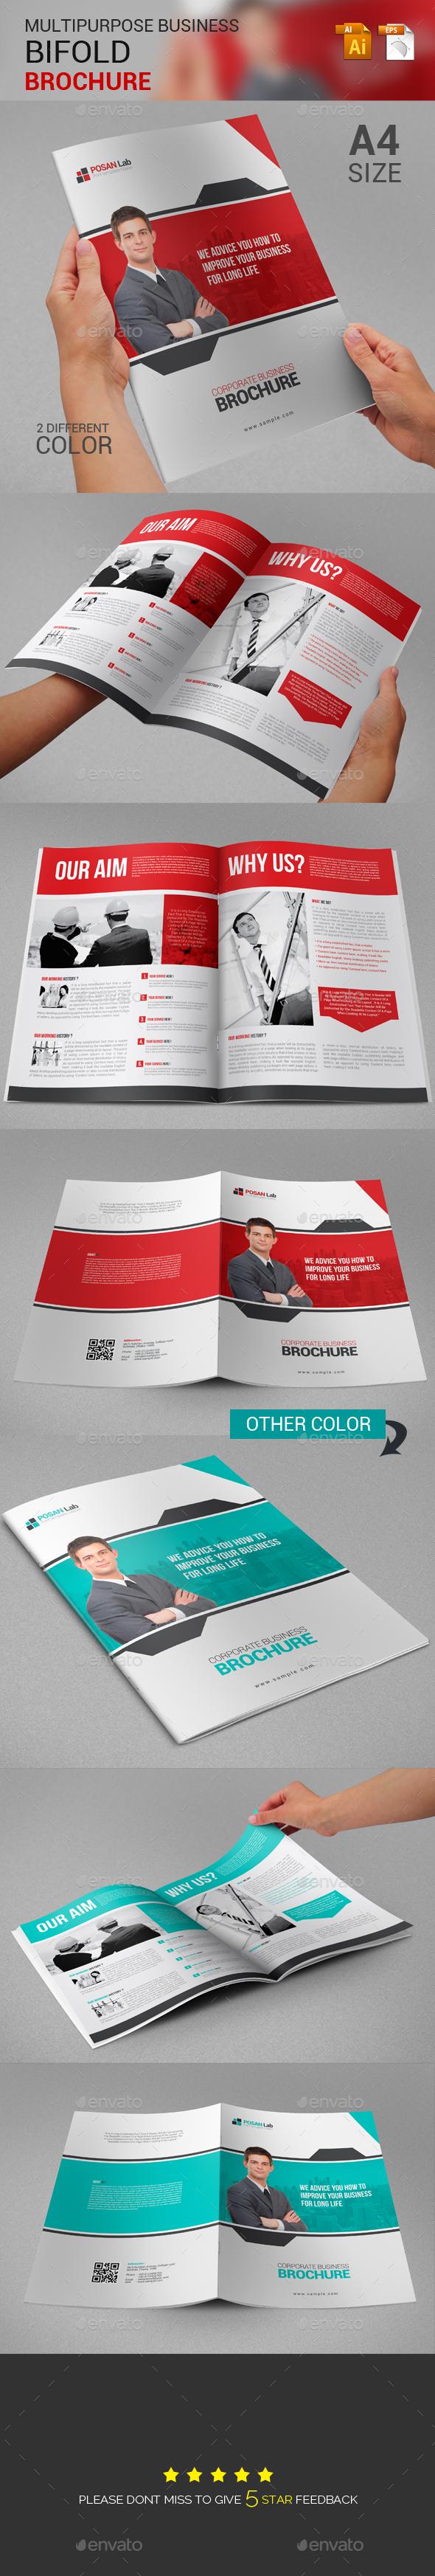 Bifold Corporate Business Brochure  - Brochures Print Templates